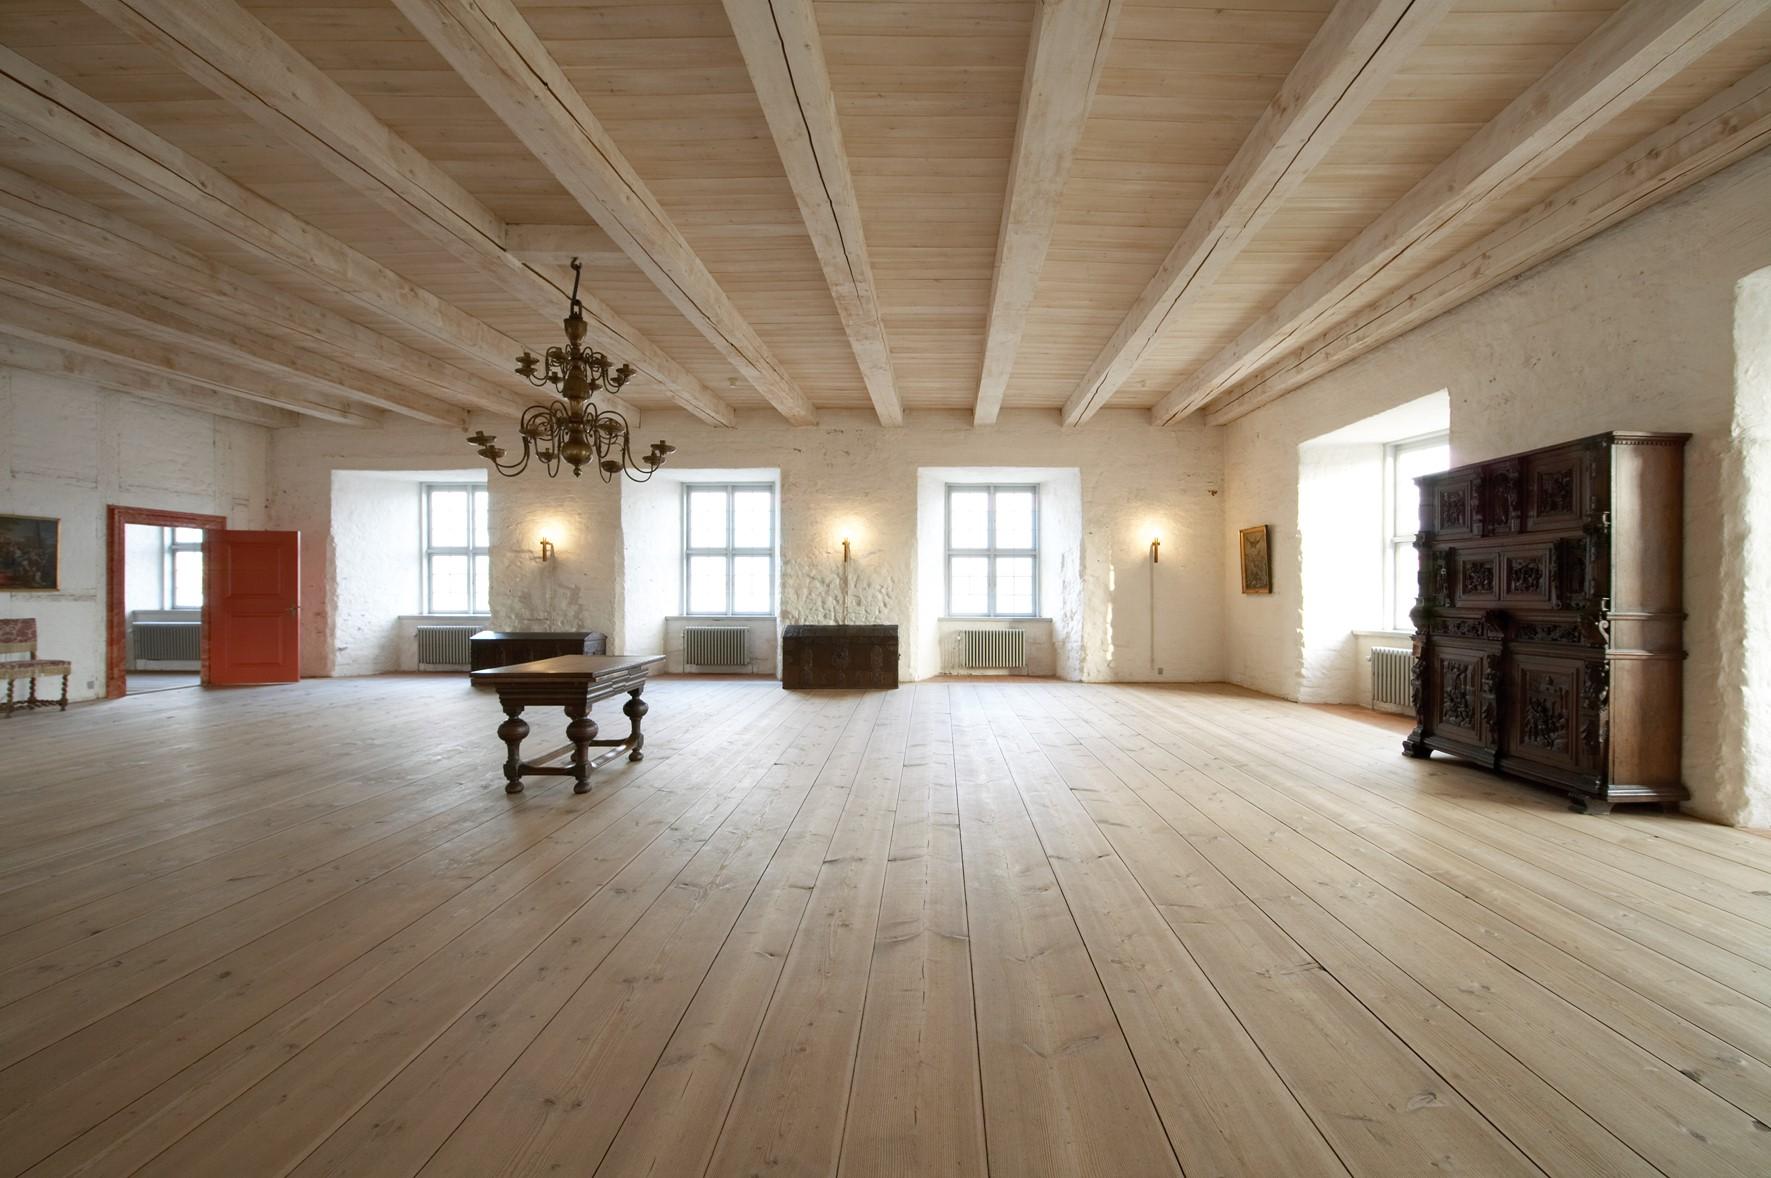 douglas fir floor untreated sonderborg castle exterior dinesen.jpg